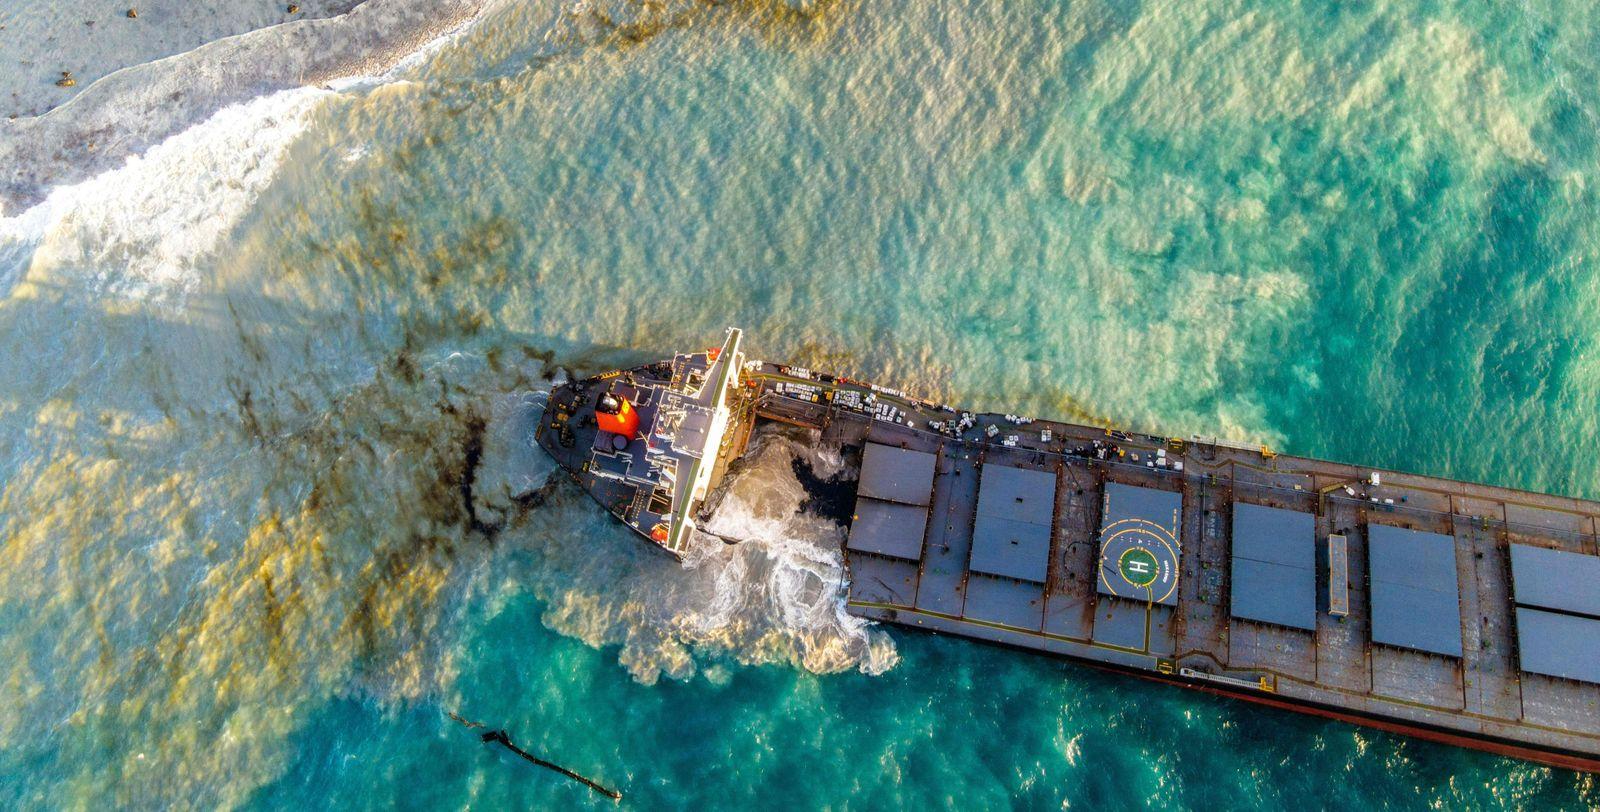 CORRECTION-MAURITIUS-ENVIRONMENT-DISASTER-OIL